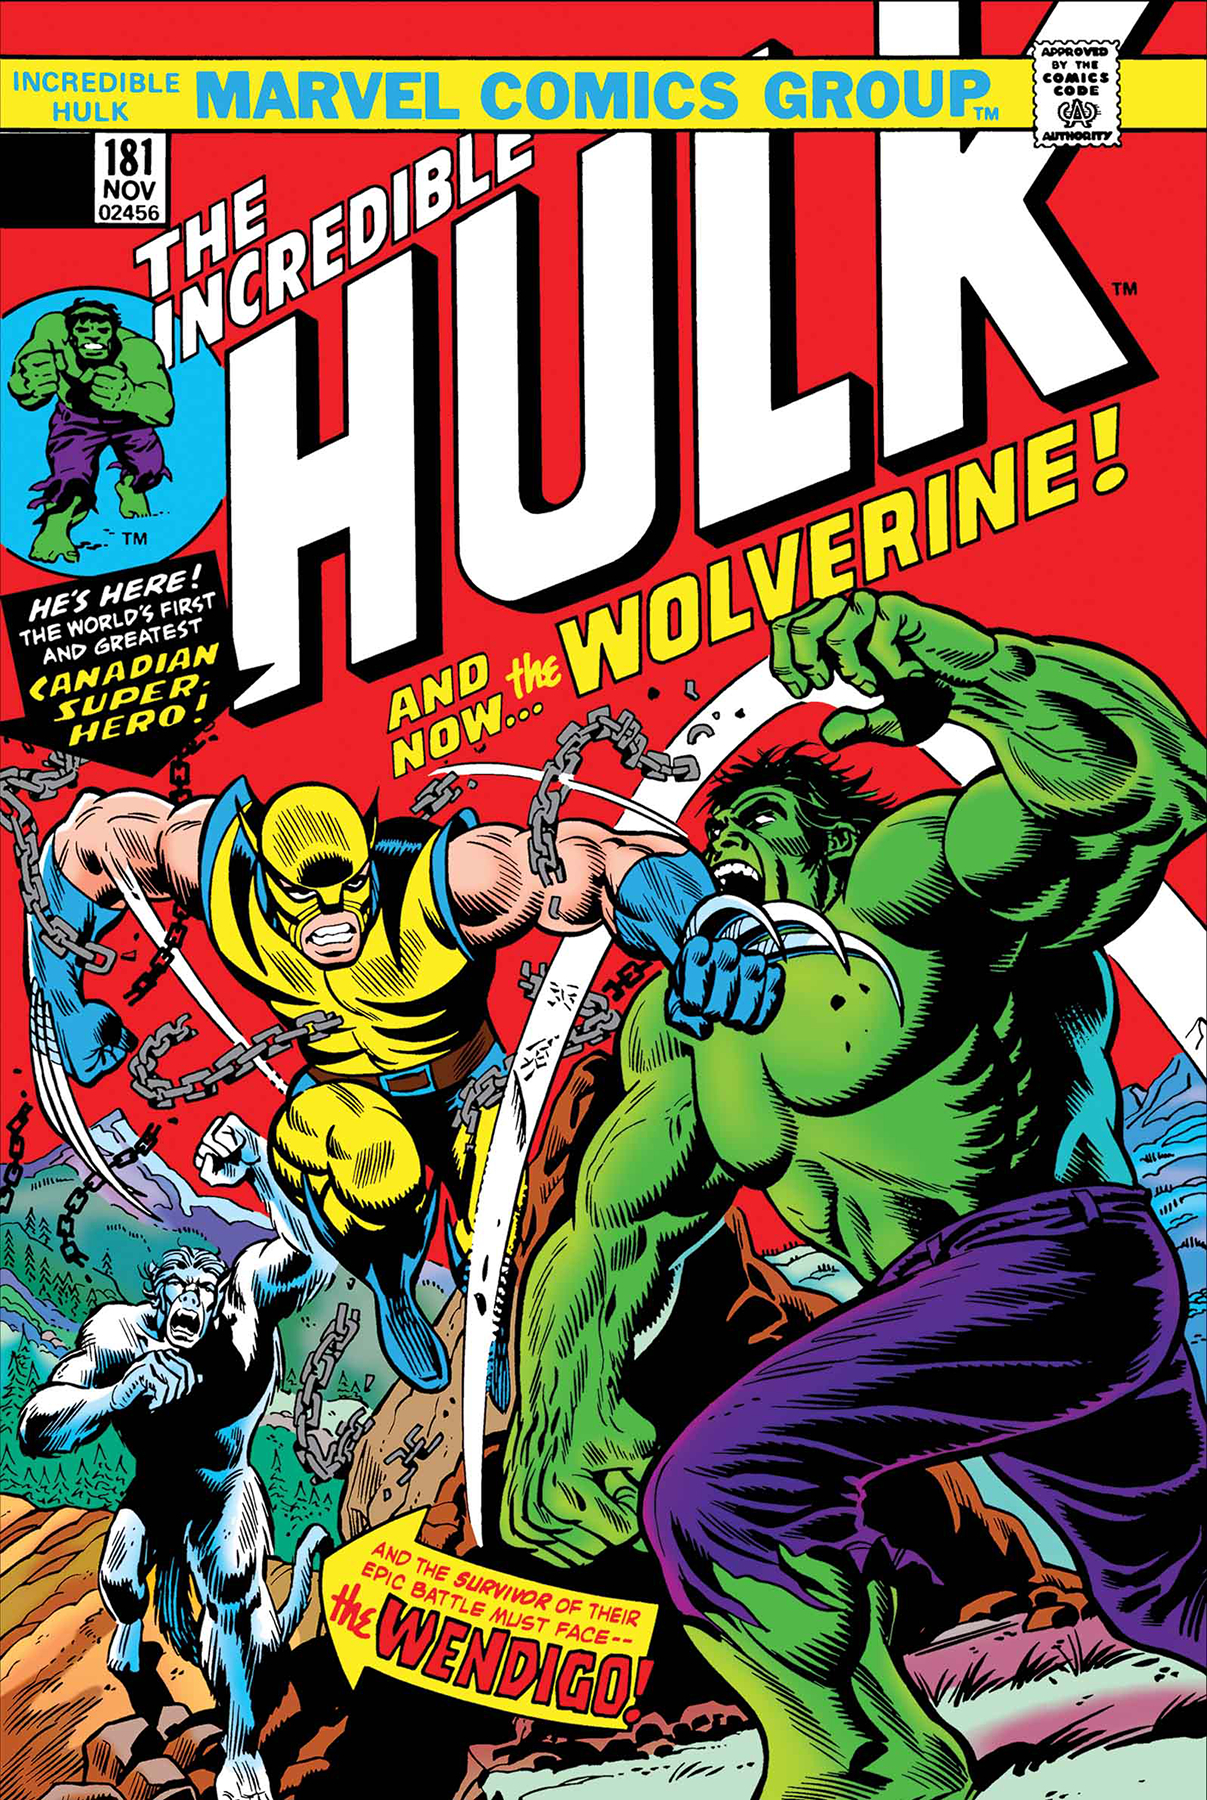 dec161046 true believers wolverine vs hulk 1 previews world